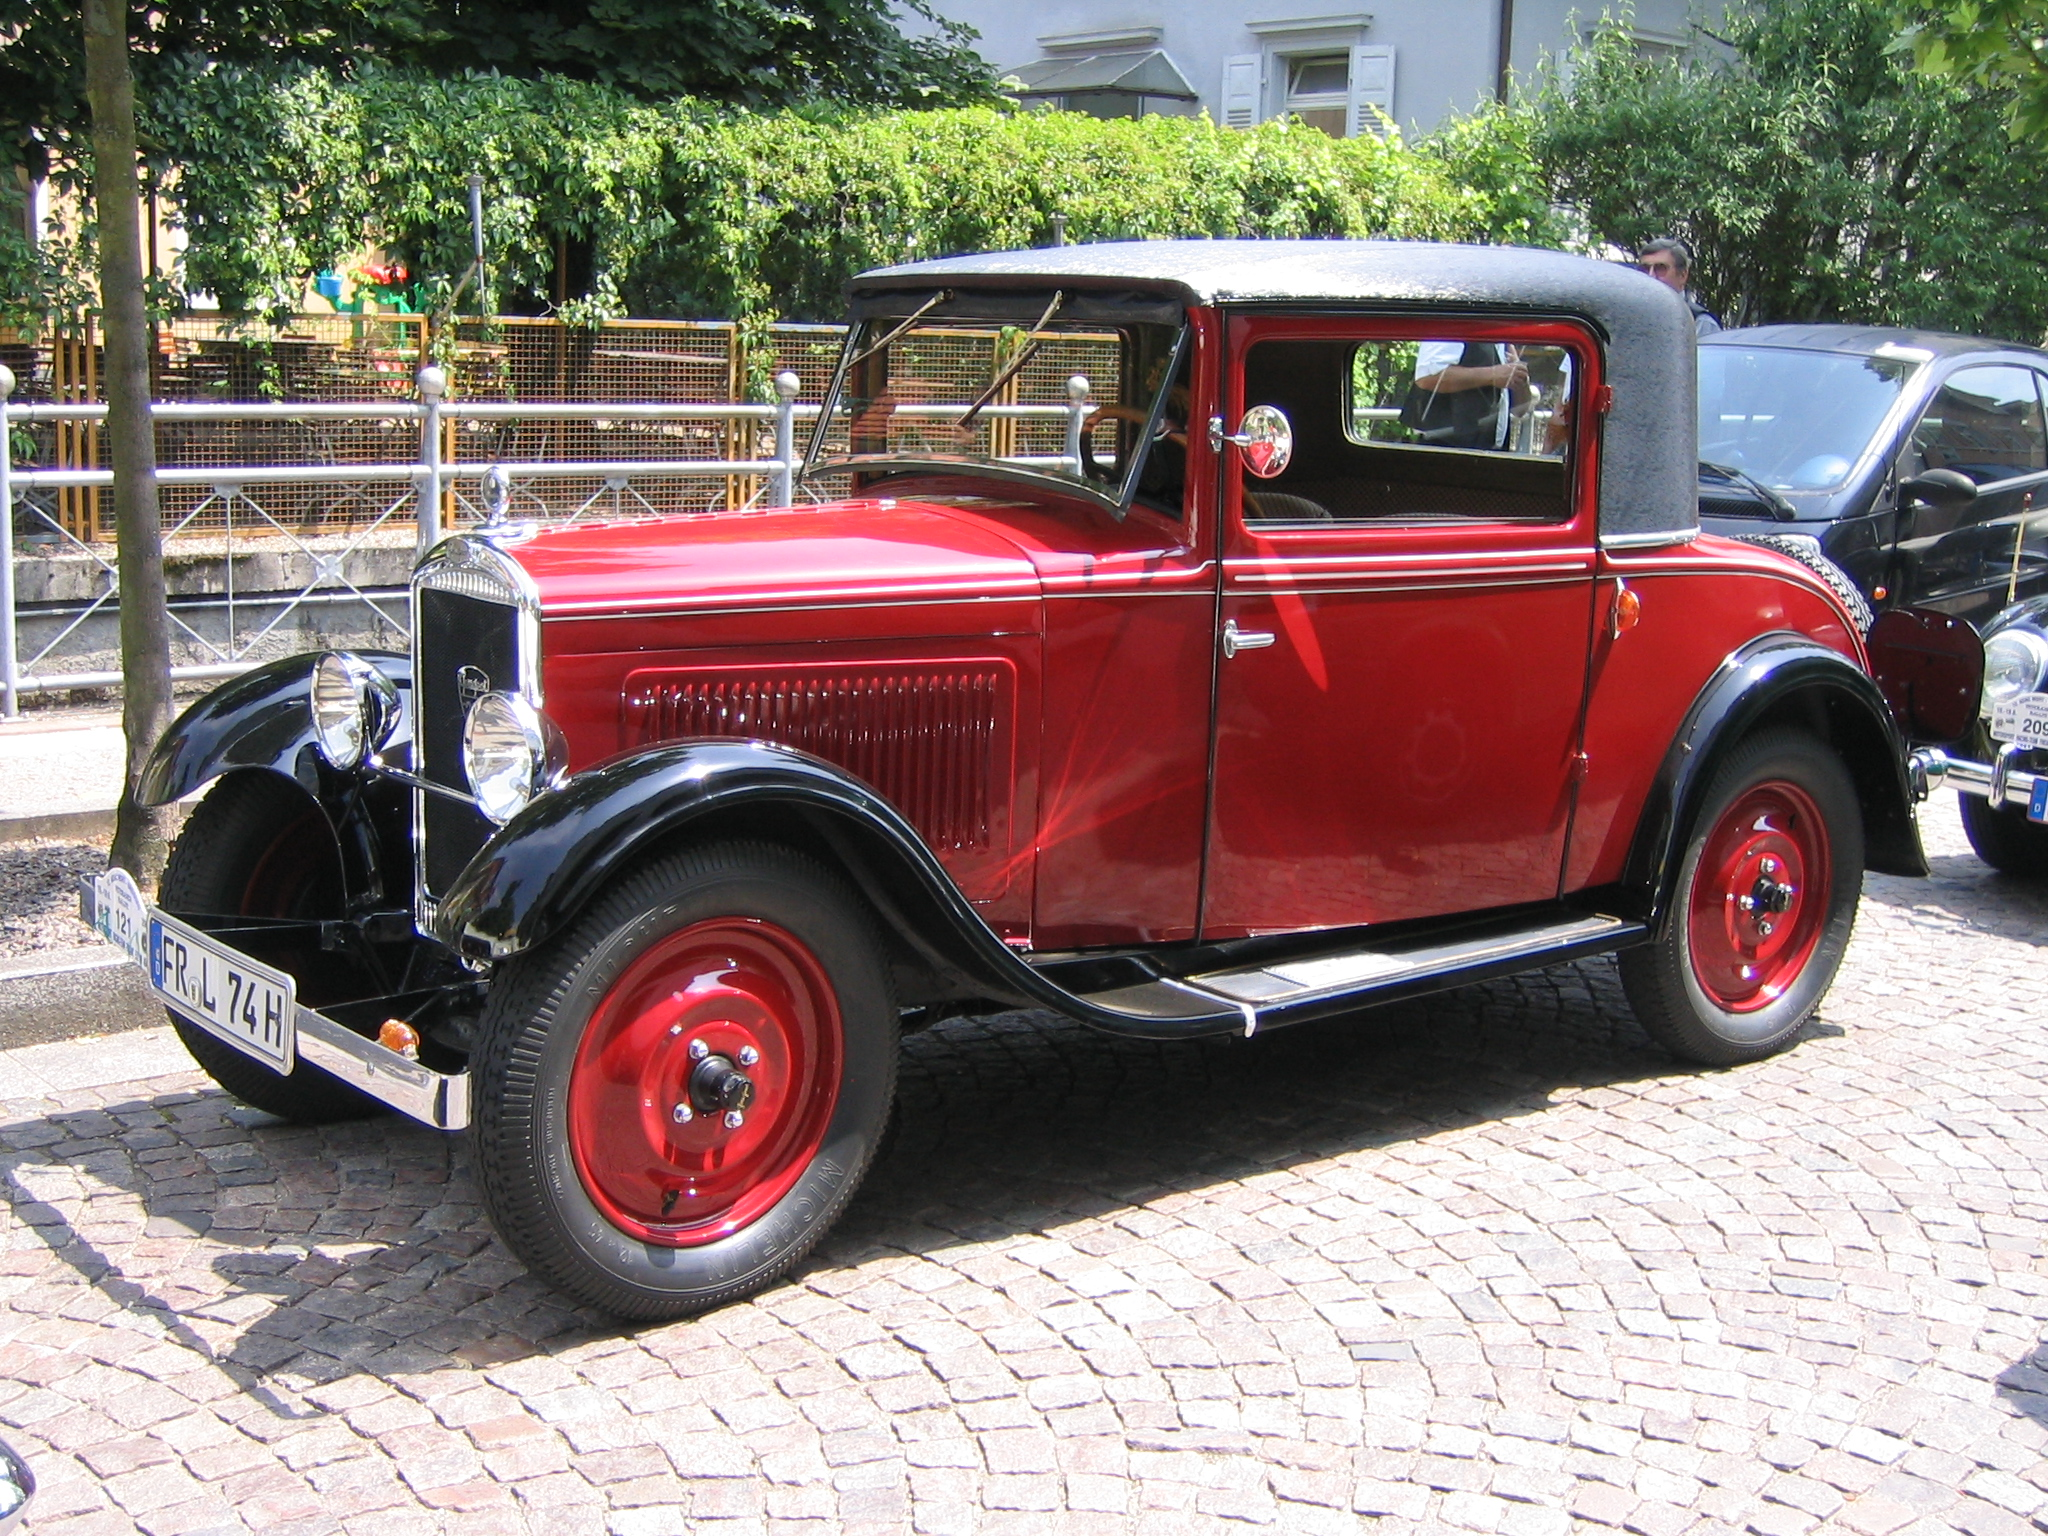 File:EM Peugeot 201 5821.jpg